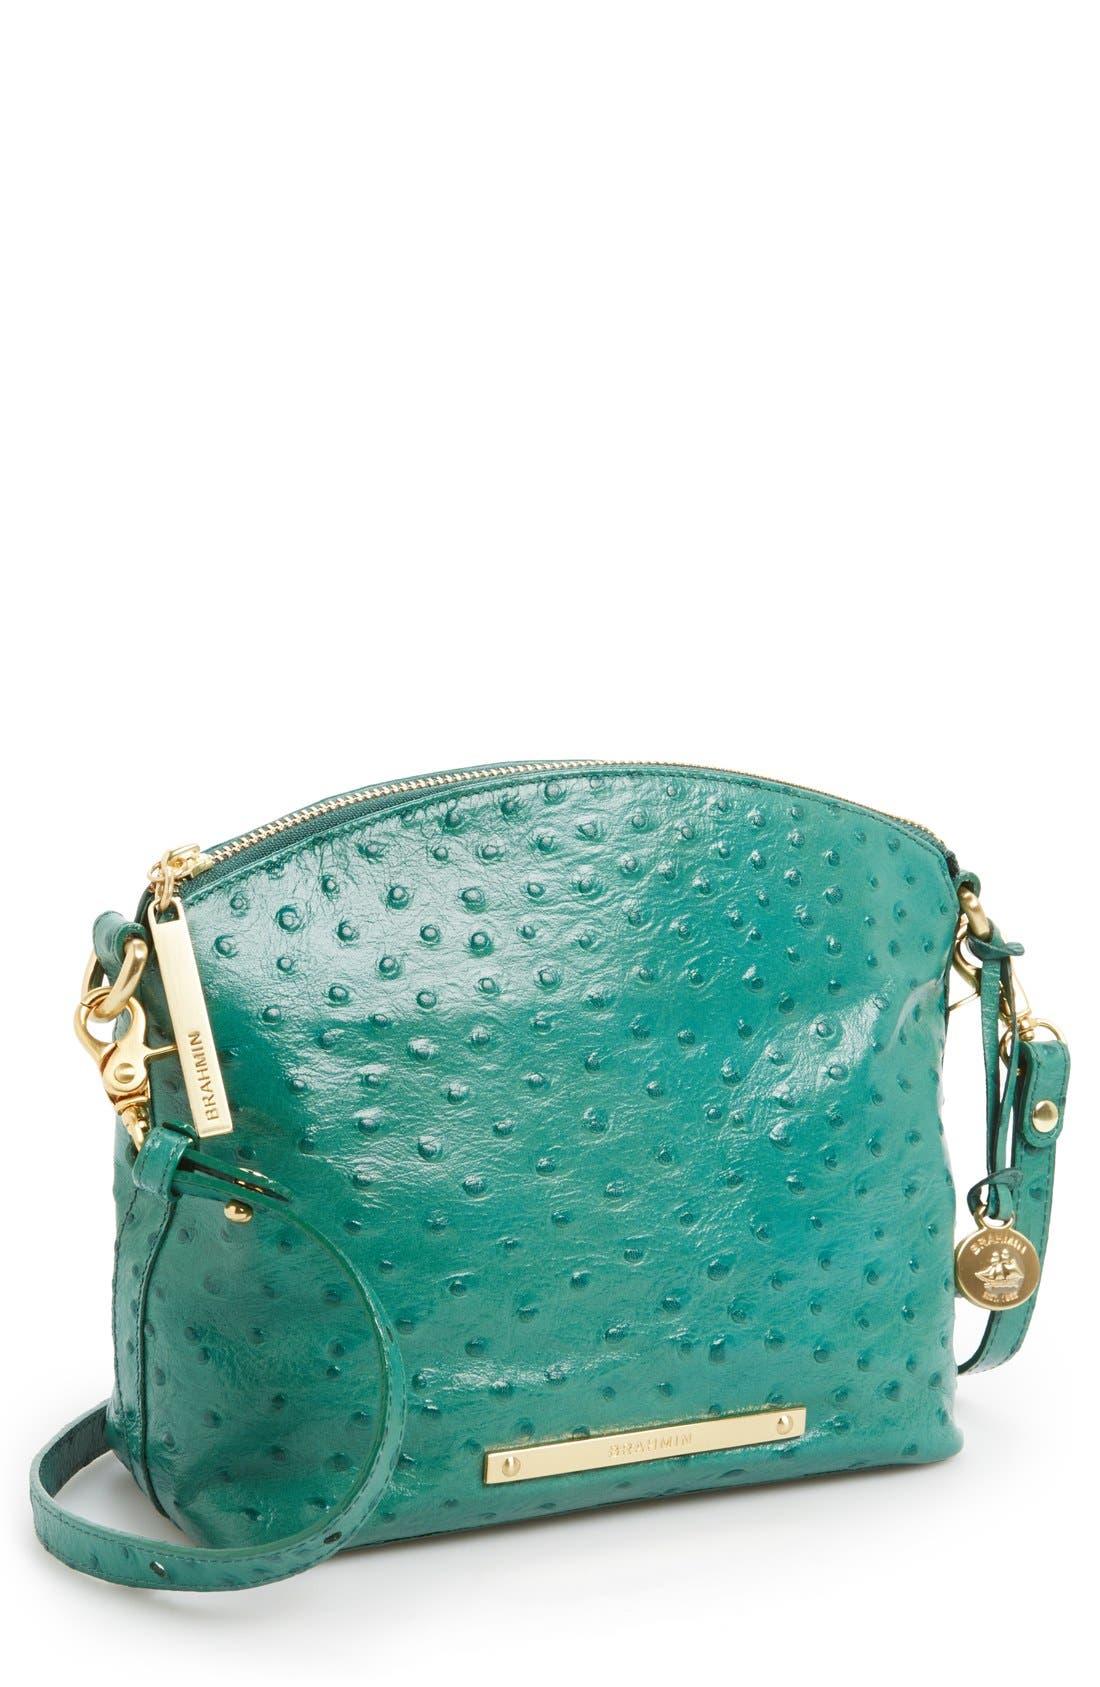 Alternate Image 1 Selected - Brahmin 'Mini Duxbury' Leather Crossbody Bag